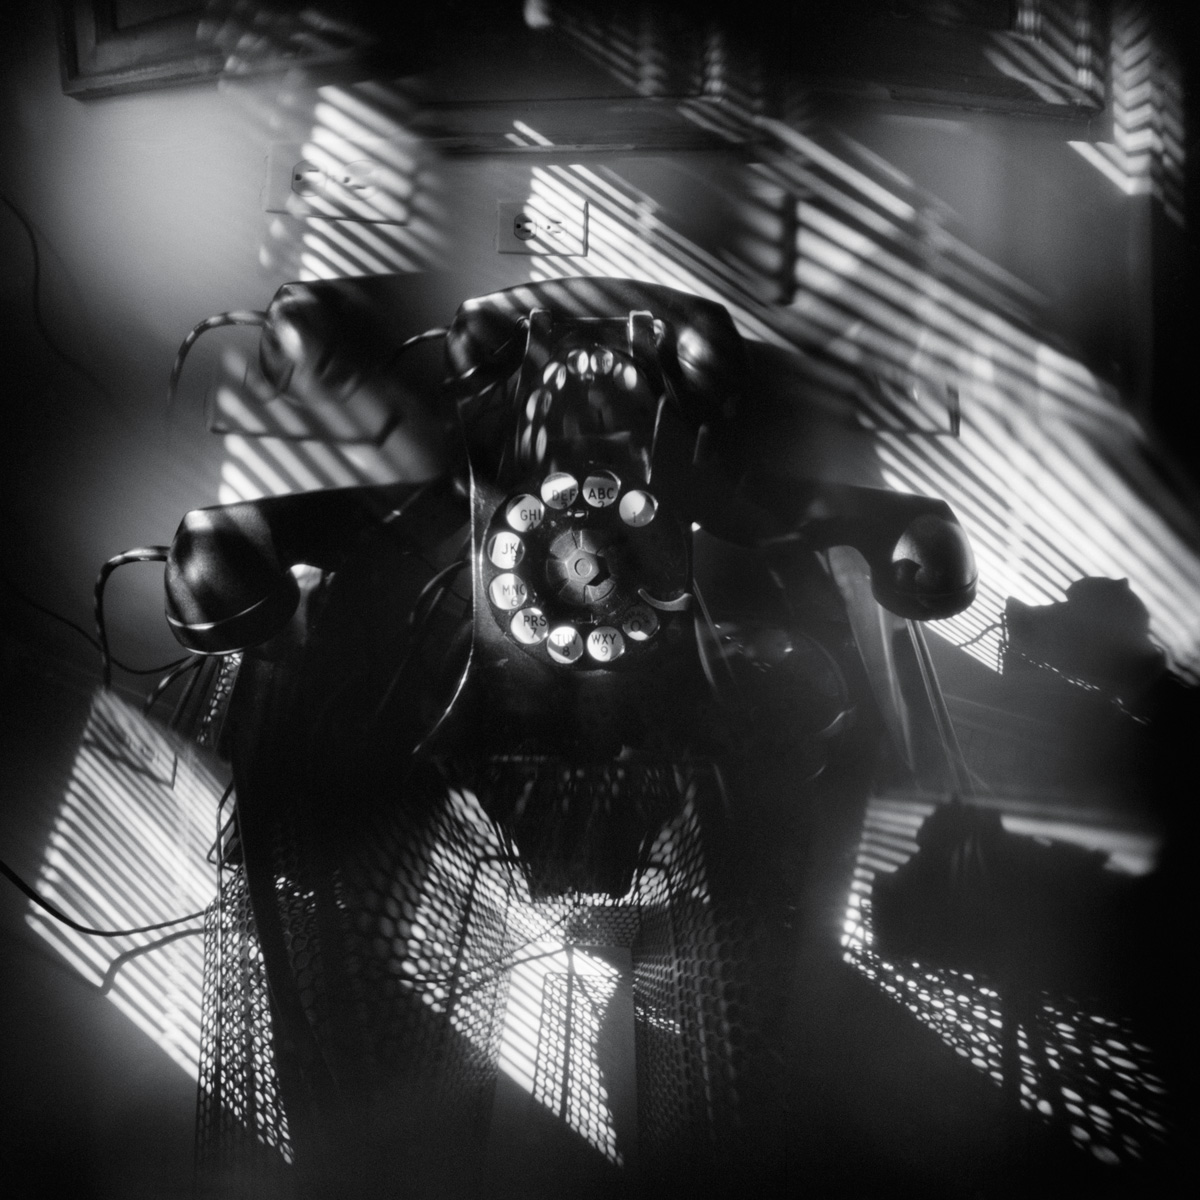 Telephone - pinhole camera photograph